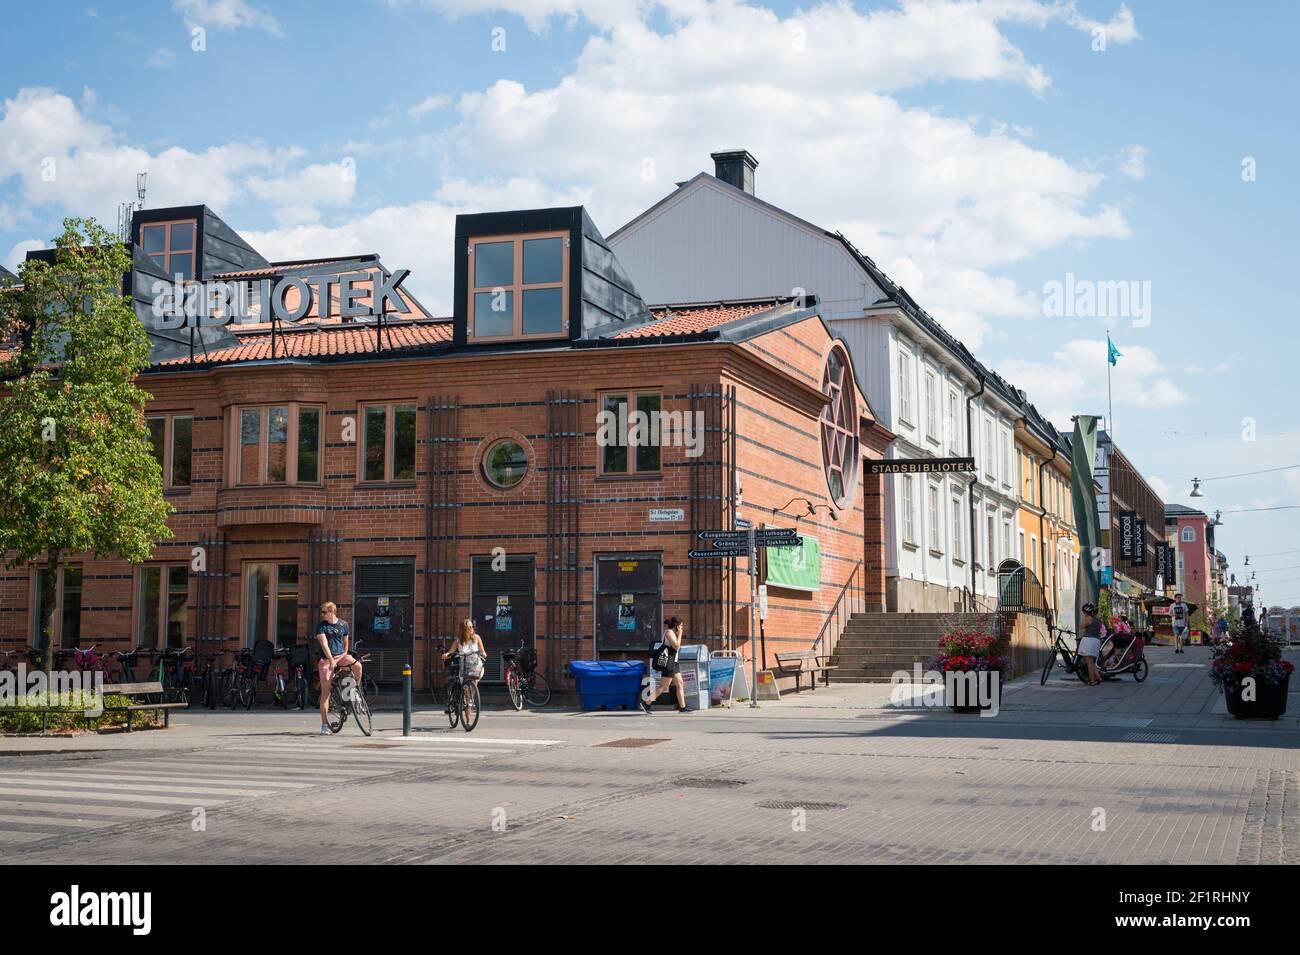 Stadsbiblioteket (City Library), Svartbäcksgatan, Uppsala, Sweden. Stock Photo